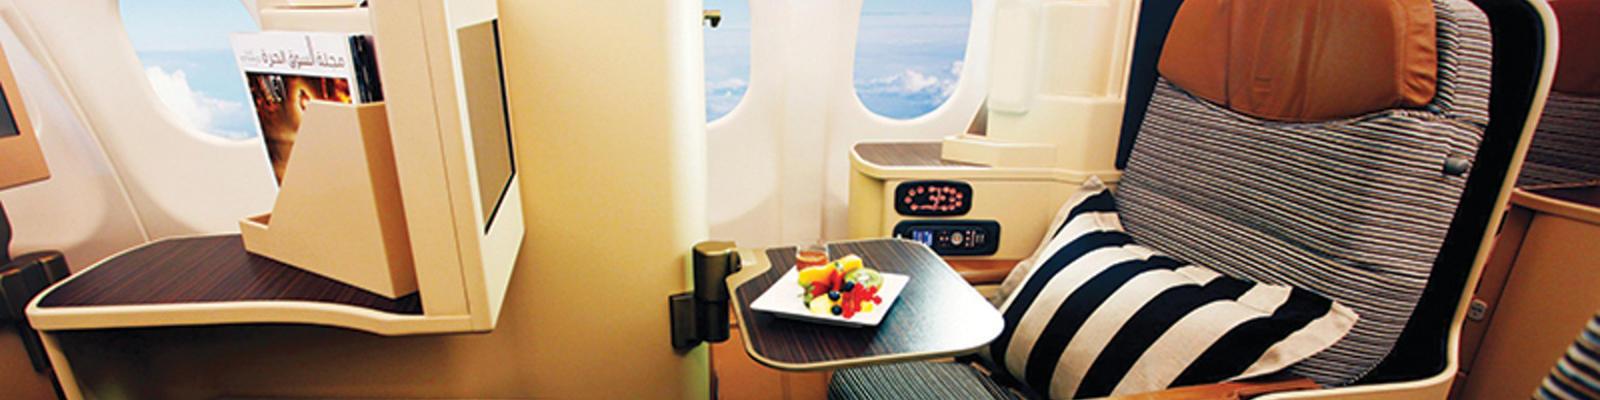 Etihad's Pearl Business Class seat